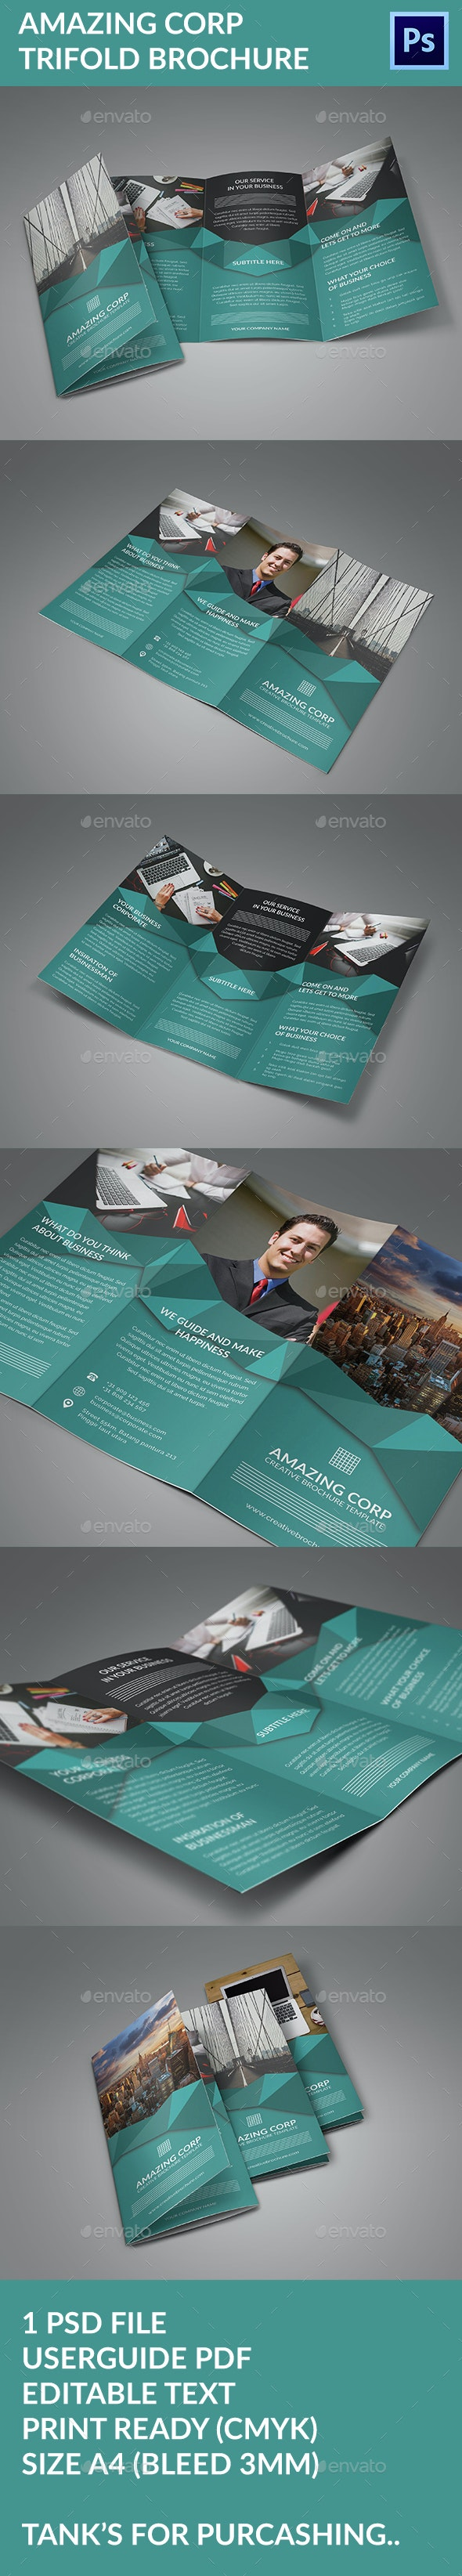 Amazing Corporate Trifold Brochure - Corporate Brochures